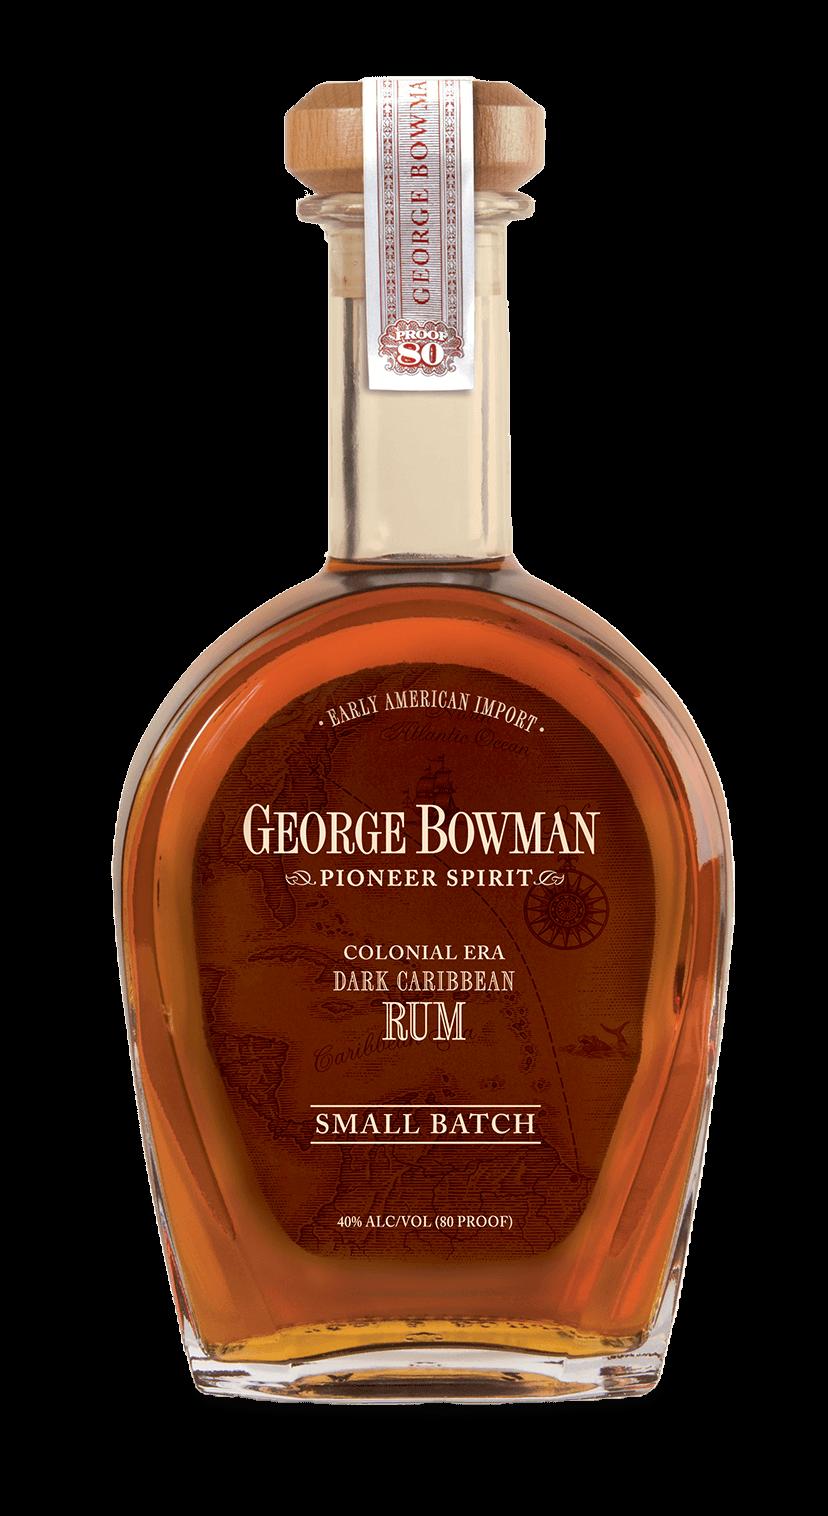 George Bowman   Small Batch Colonial Era Dark Caribbean Rum   A. Smith Bowman Distillery